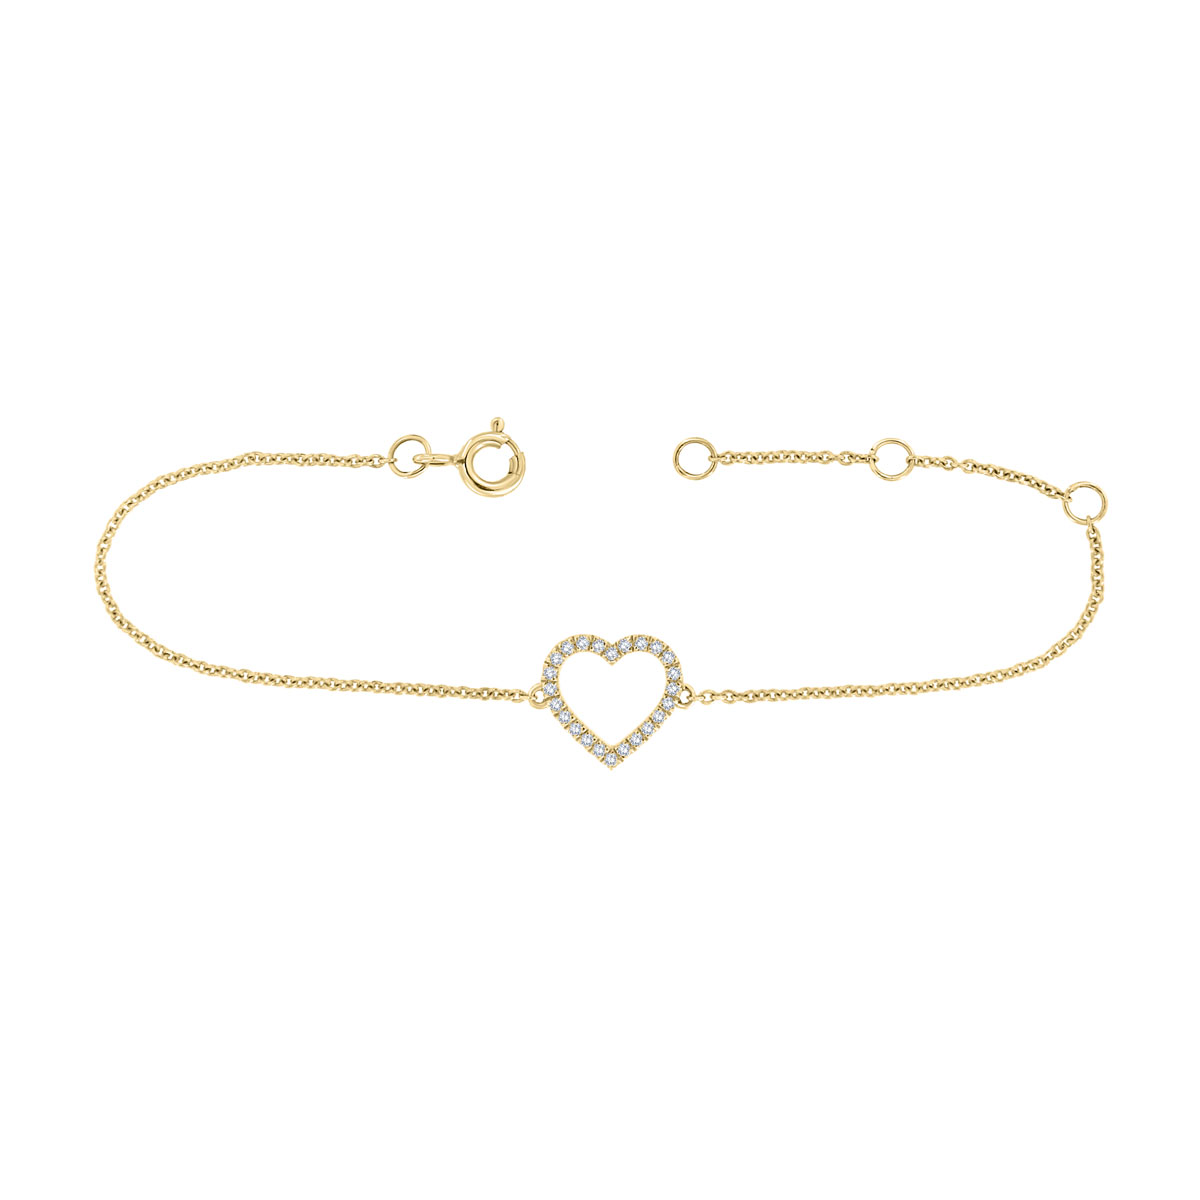 18K Yellow Gold Petite Heart Diamond Bracelet (1/10 ct. tw)